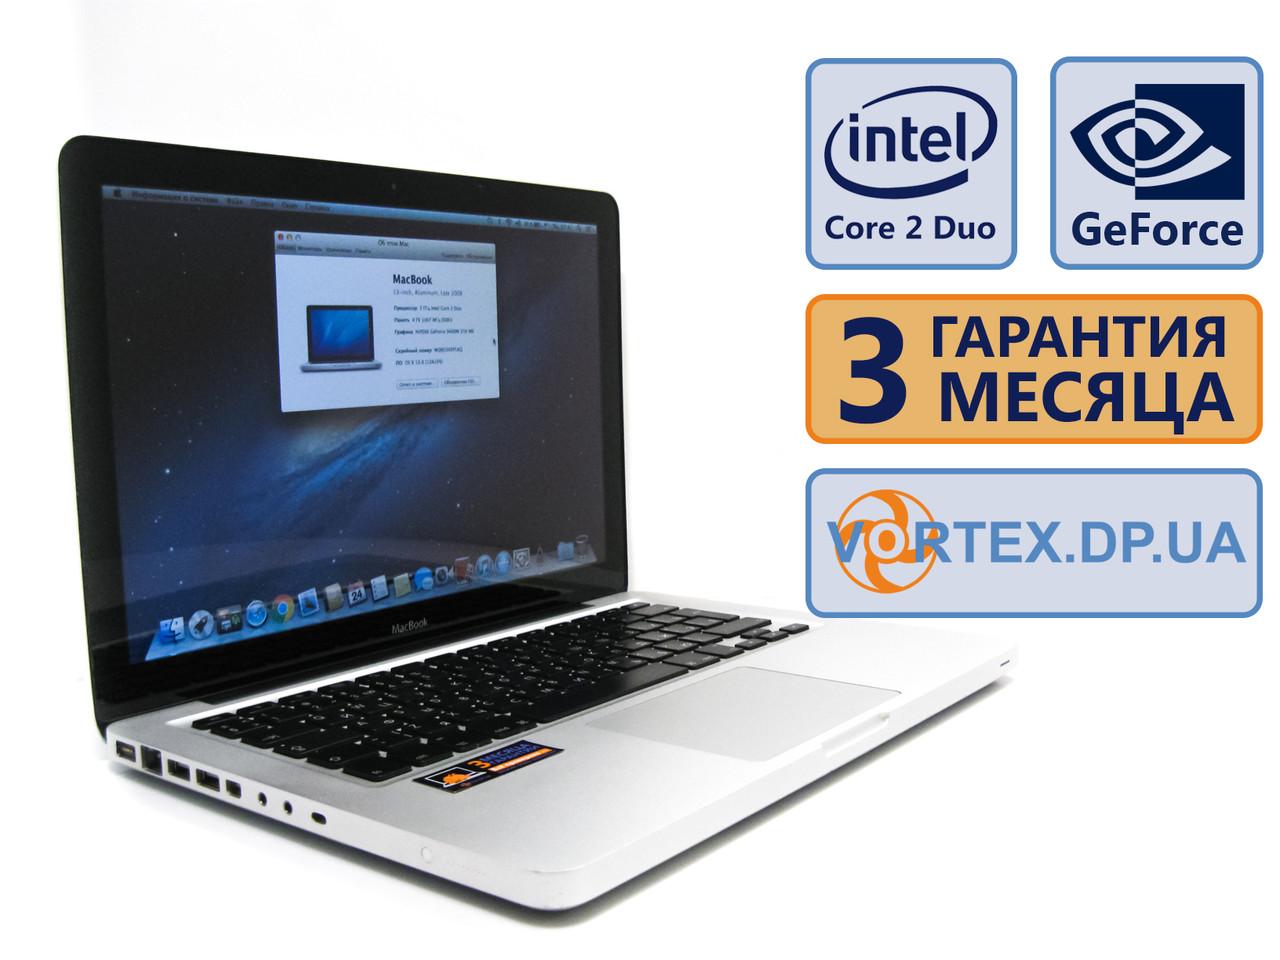 Ноутбук Apple MacBook Pro A1278 (2008) 13 (1280x800) / Intel Core 2 Duo P7350 (2x2GHz) / GeForce 9400M/RAM 4Gb/HDD 160Gb/АКБ 1 ч. /Сост. 9/10 БУ